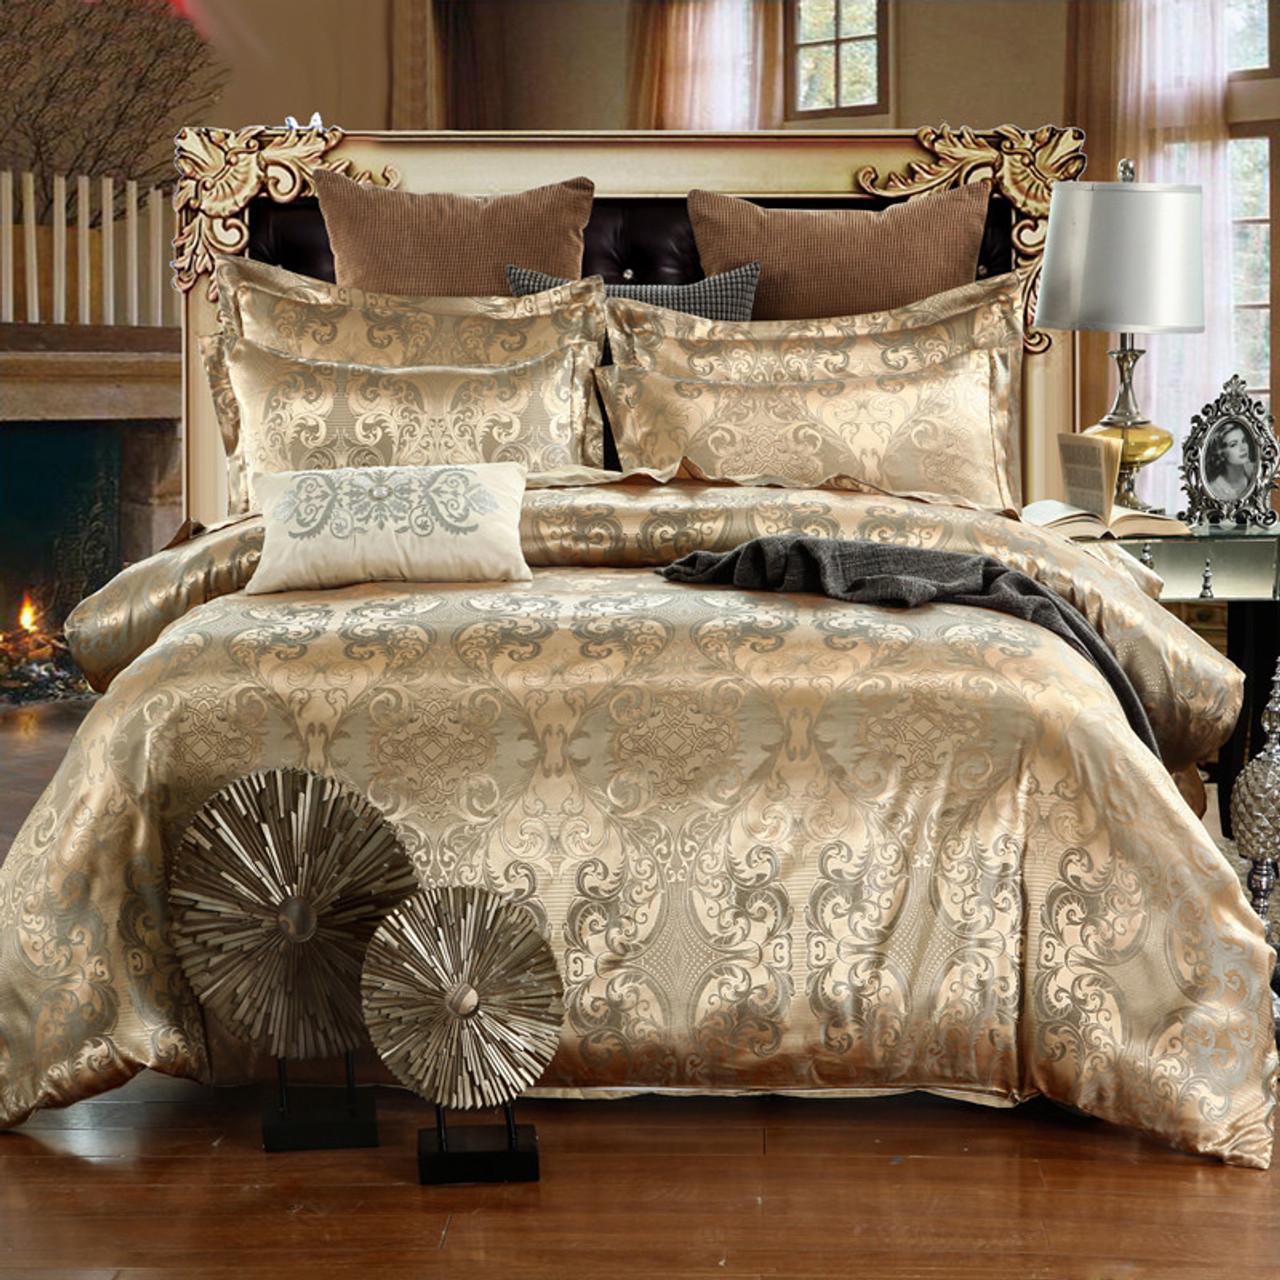 Luxury Bedding Sets Jacquard Queen King Size Duvet Cover Set Wedding Bedclothes Bed Linen Quilt Cover Onshopdeals Com